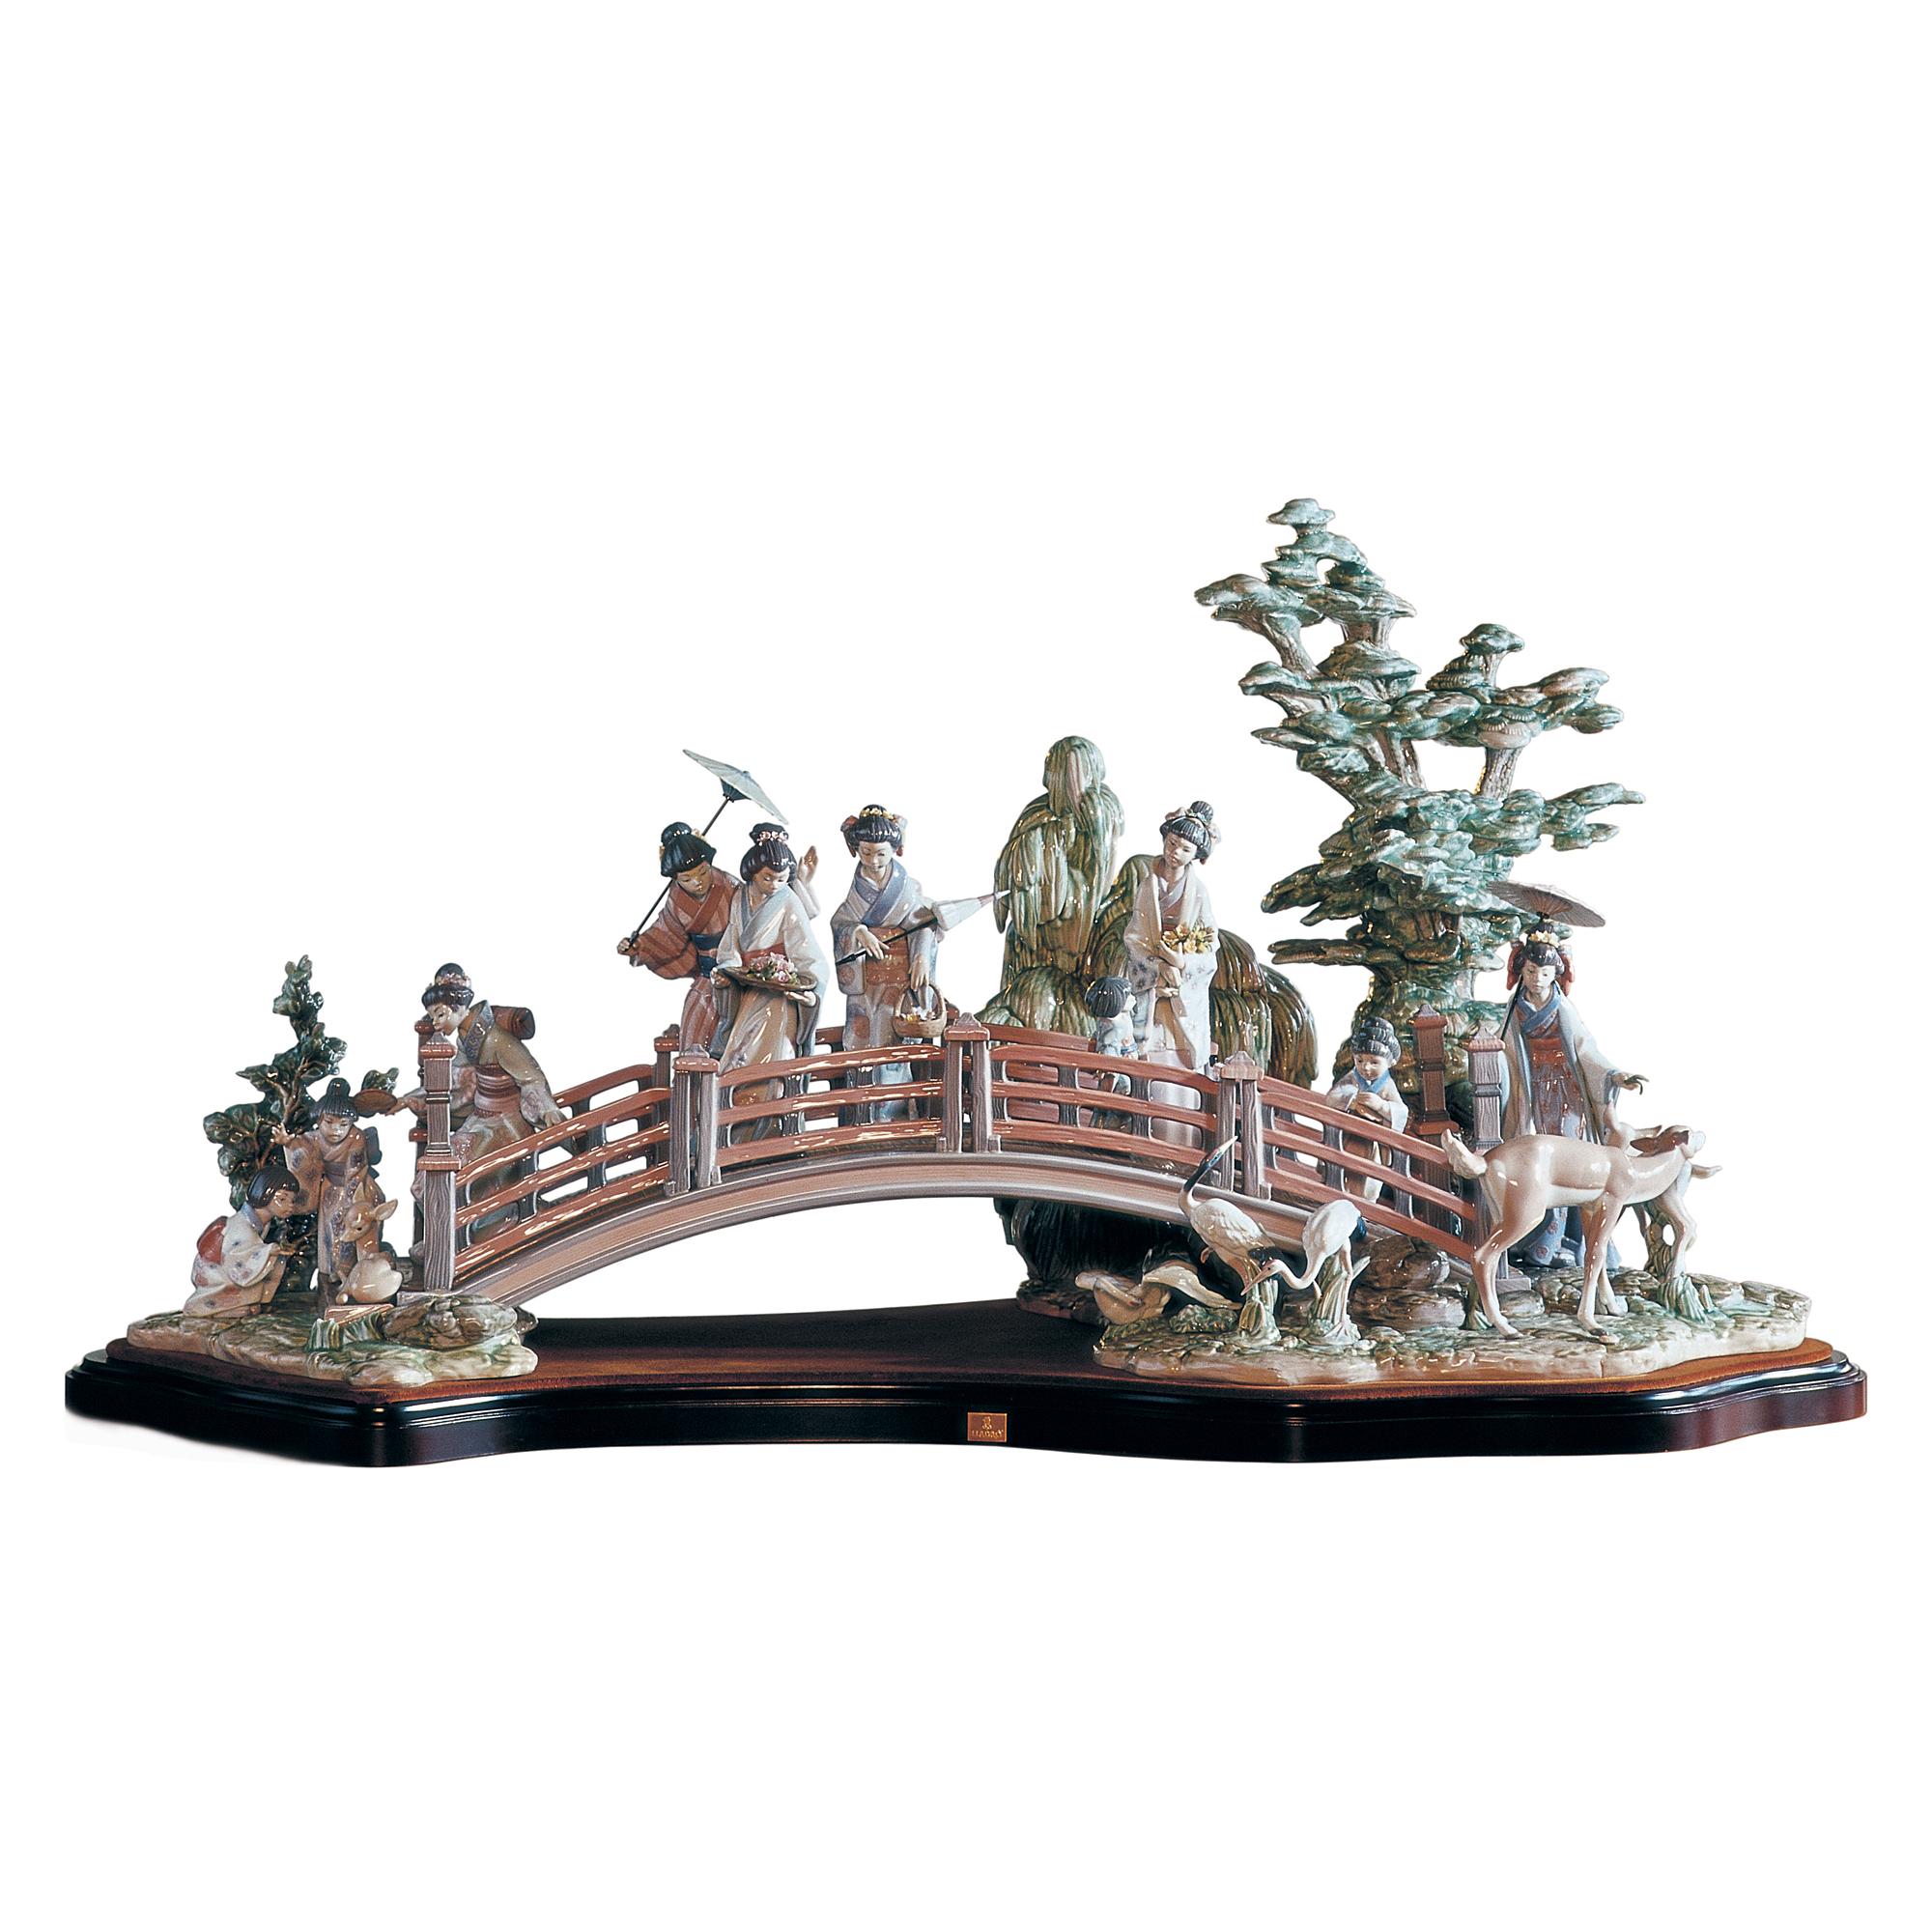 Oriental Garden 1001775 - Lladro; Ltd. edition of 750 pcs; issued 1993 by Sculptor Salvado Debon